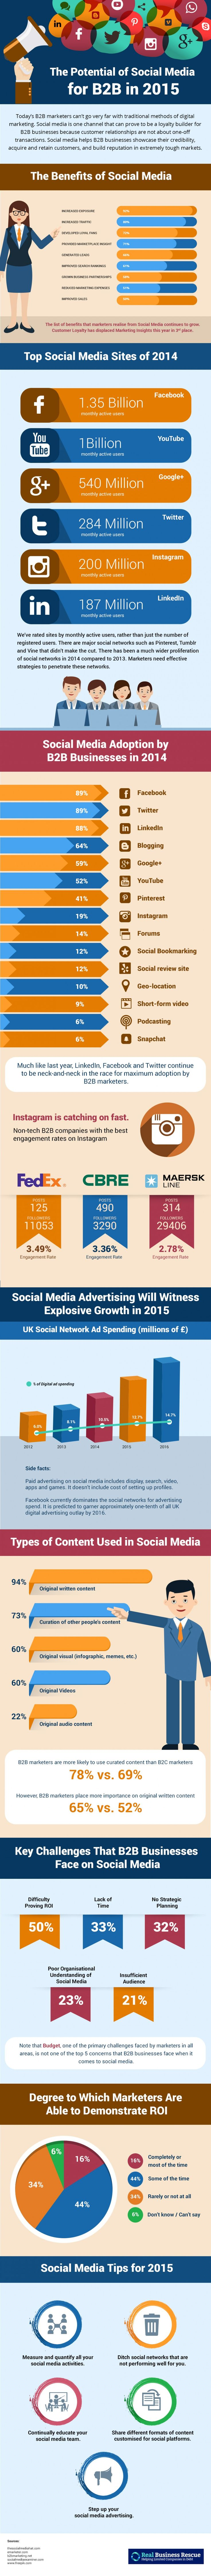 The Potential of #SocialMedia for B2B in 2015 [ #infographic ]